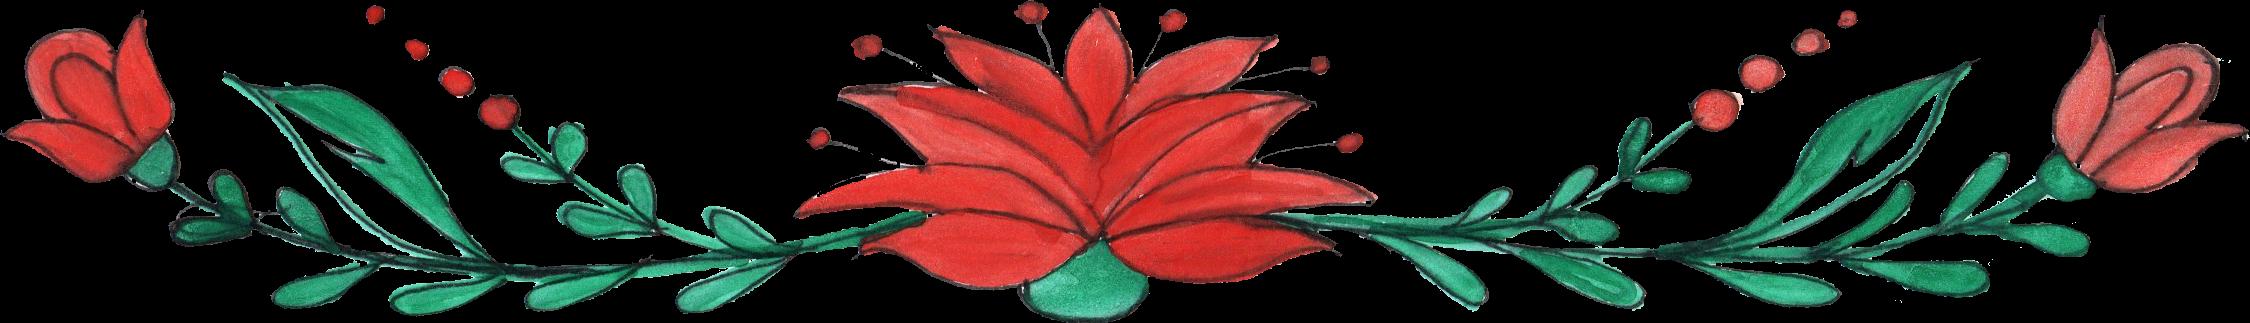 Free Download Flower Border Ornament 1